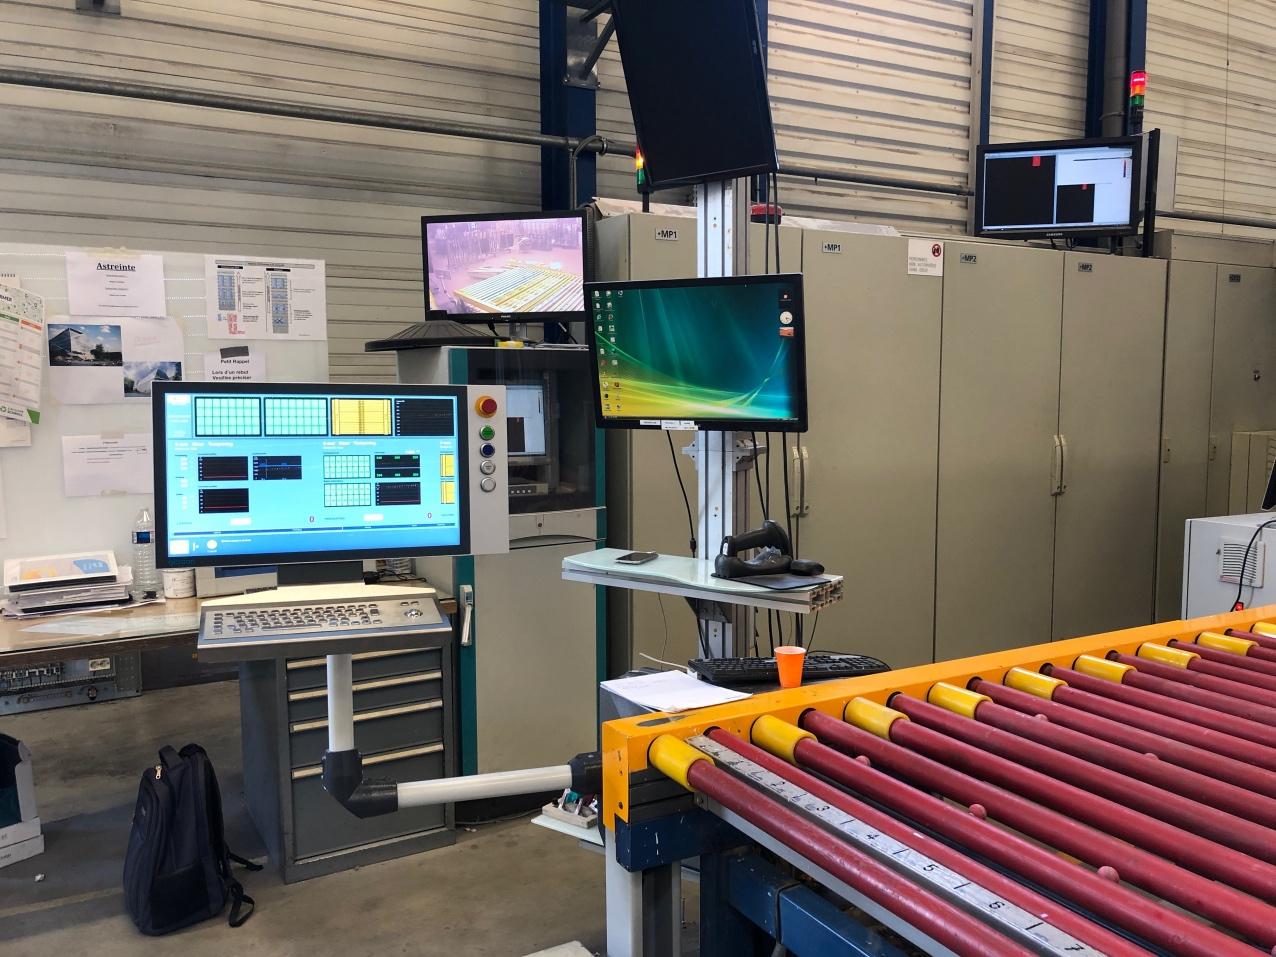 Uppgradering ProE-CC-2442